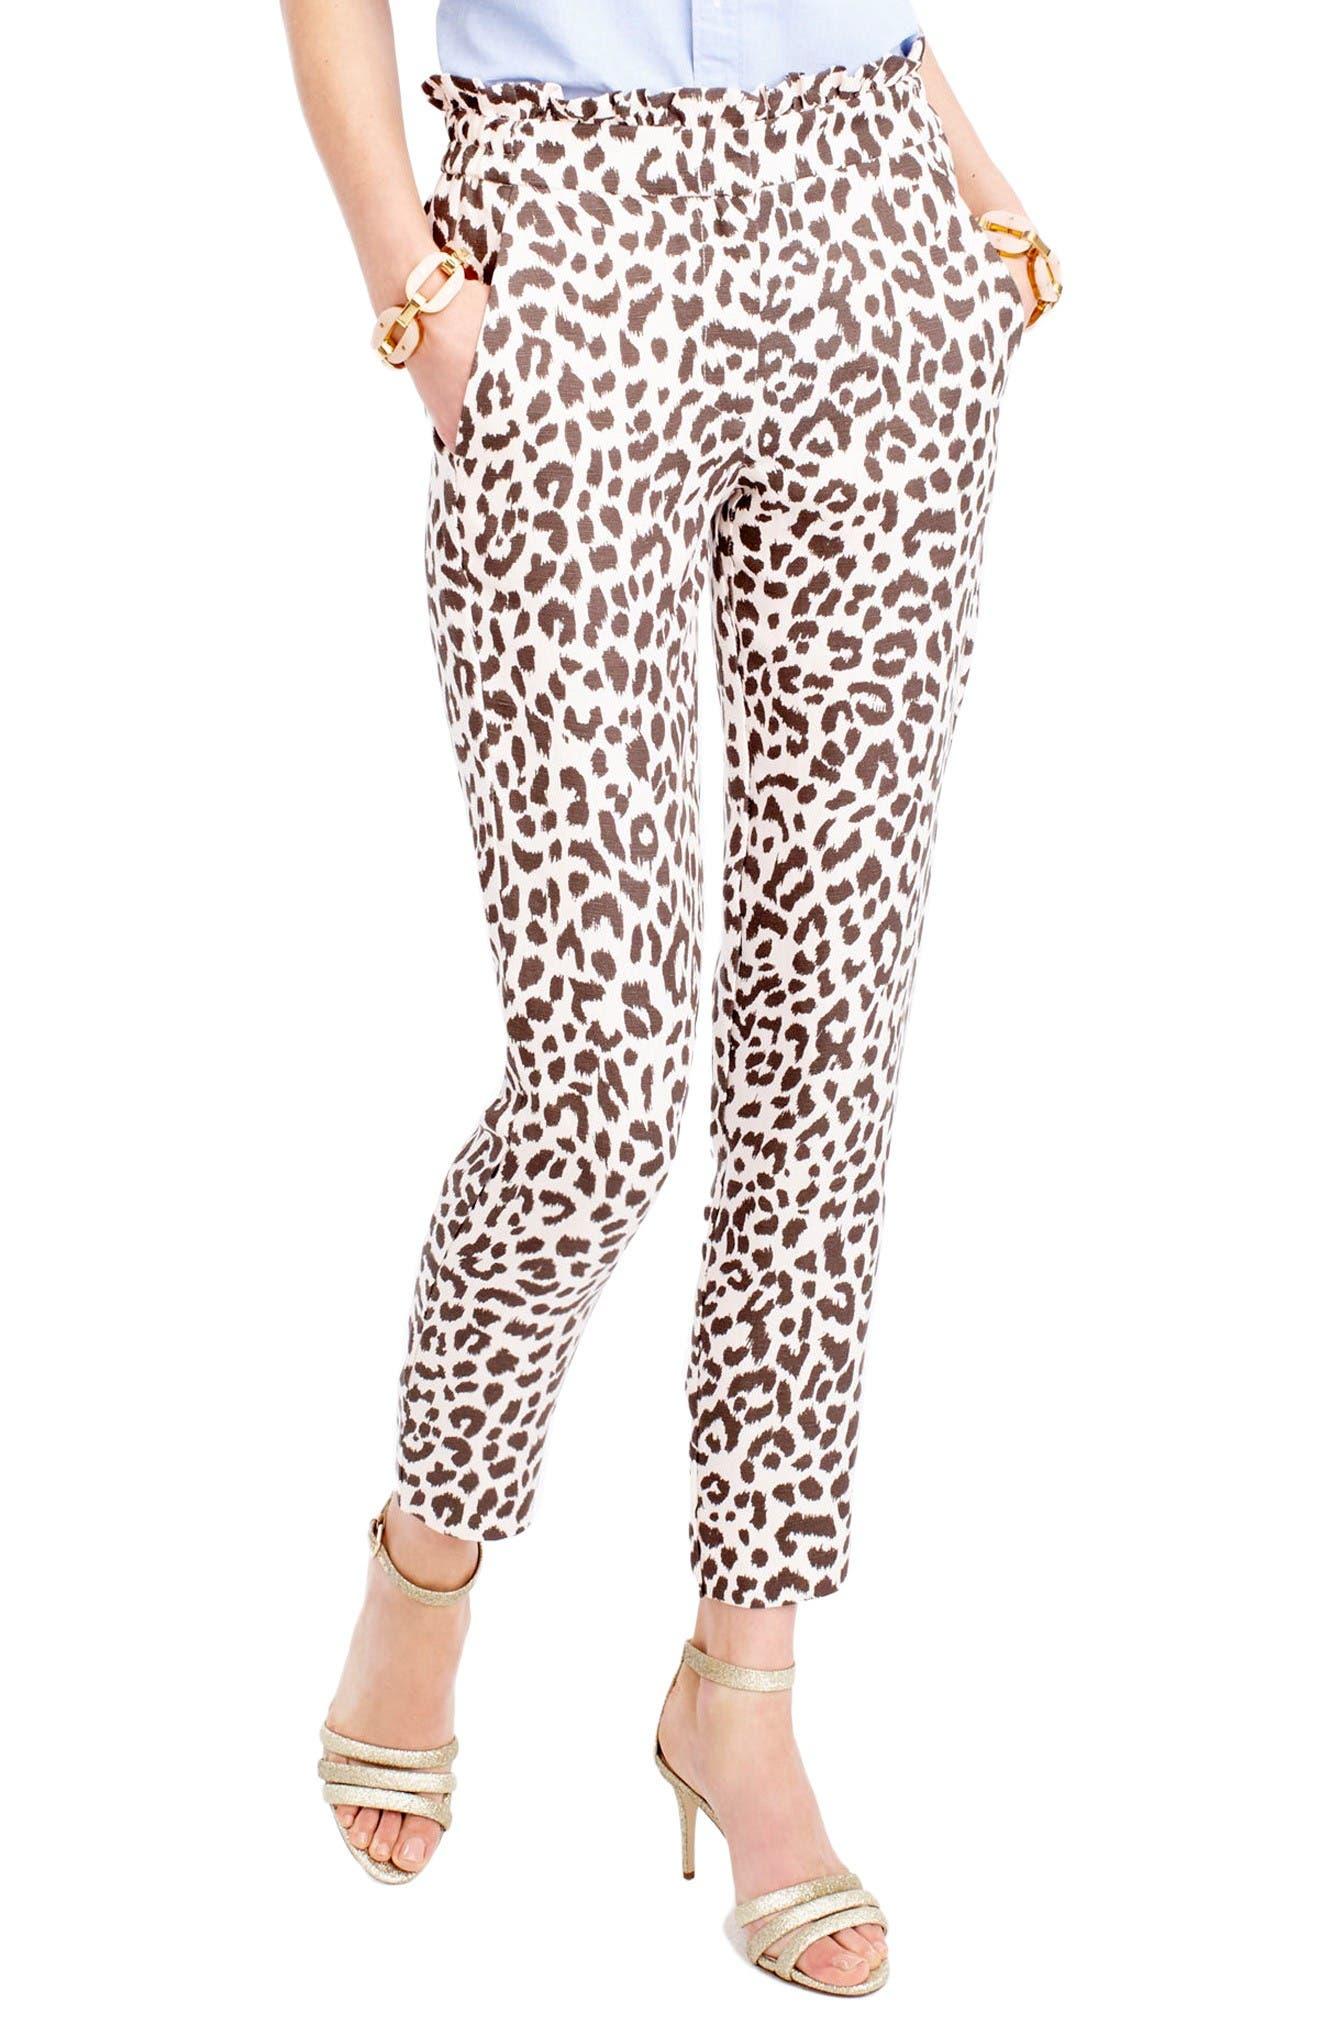 Main Image - J.Crew Ruffle Waist Leopard Print Linen Pants (Regular & Petite)